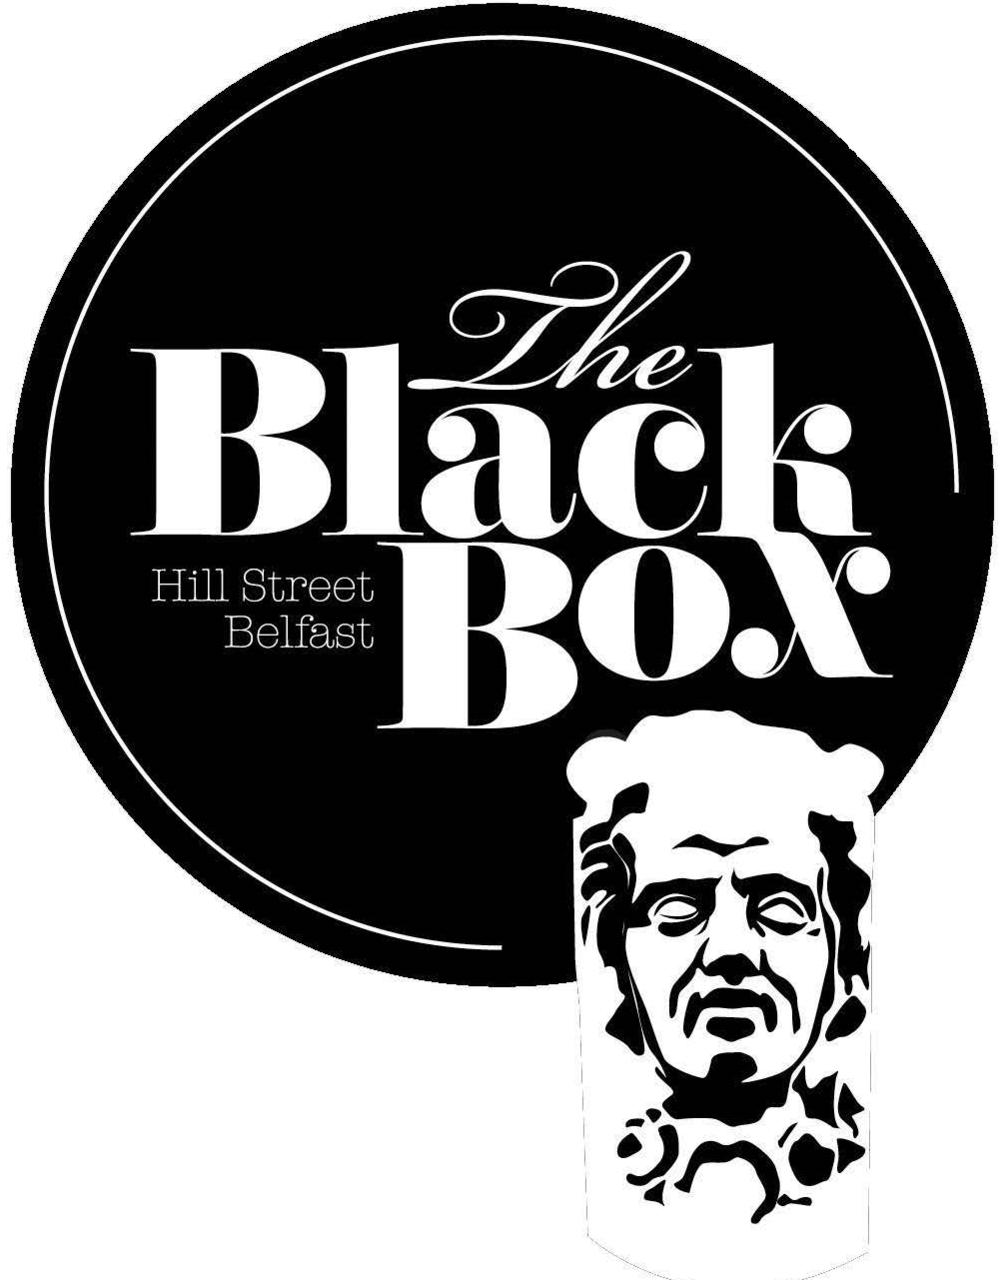 Image 27 - Black Box.png